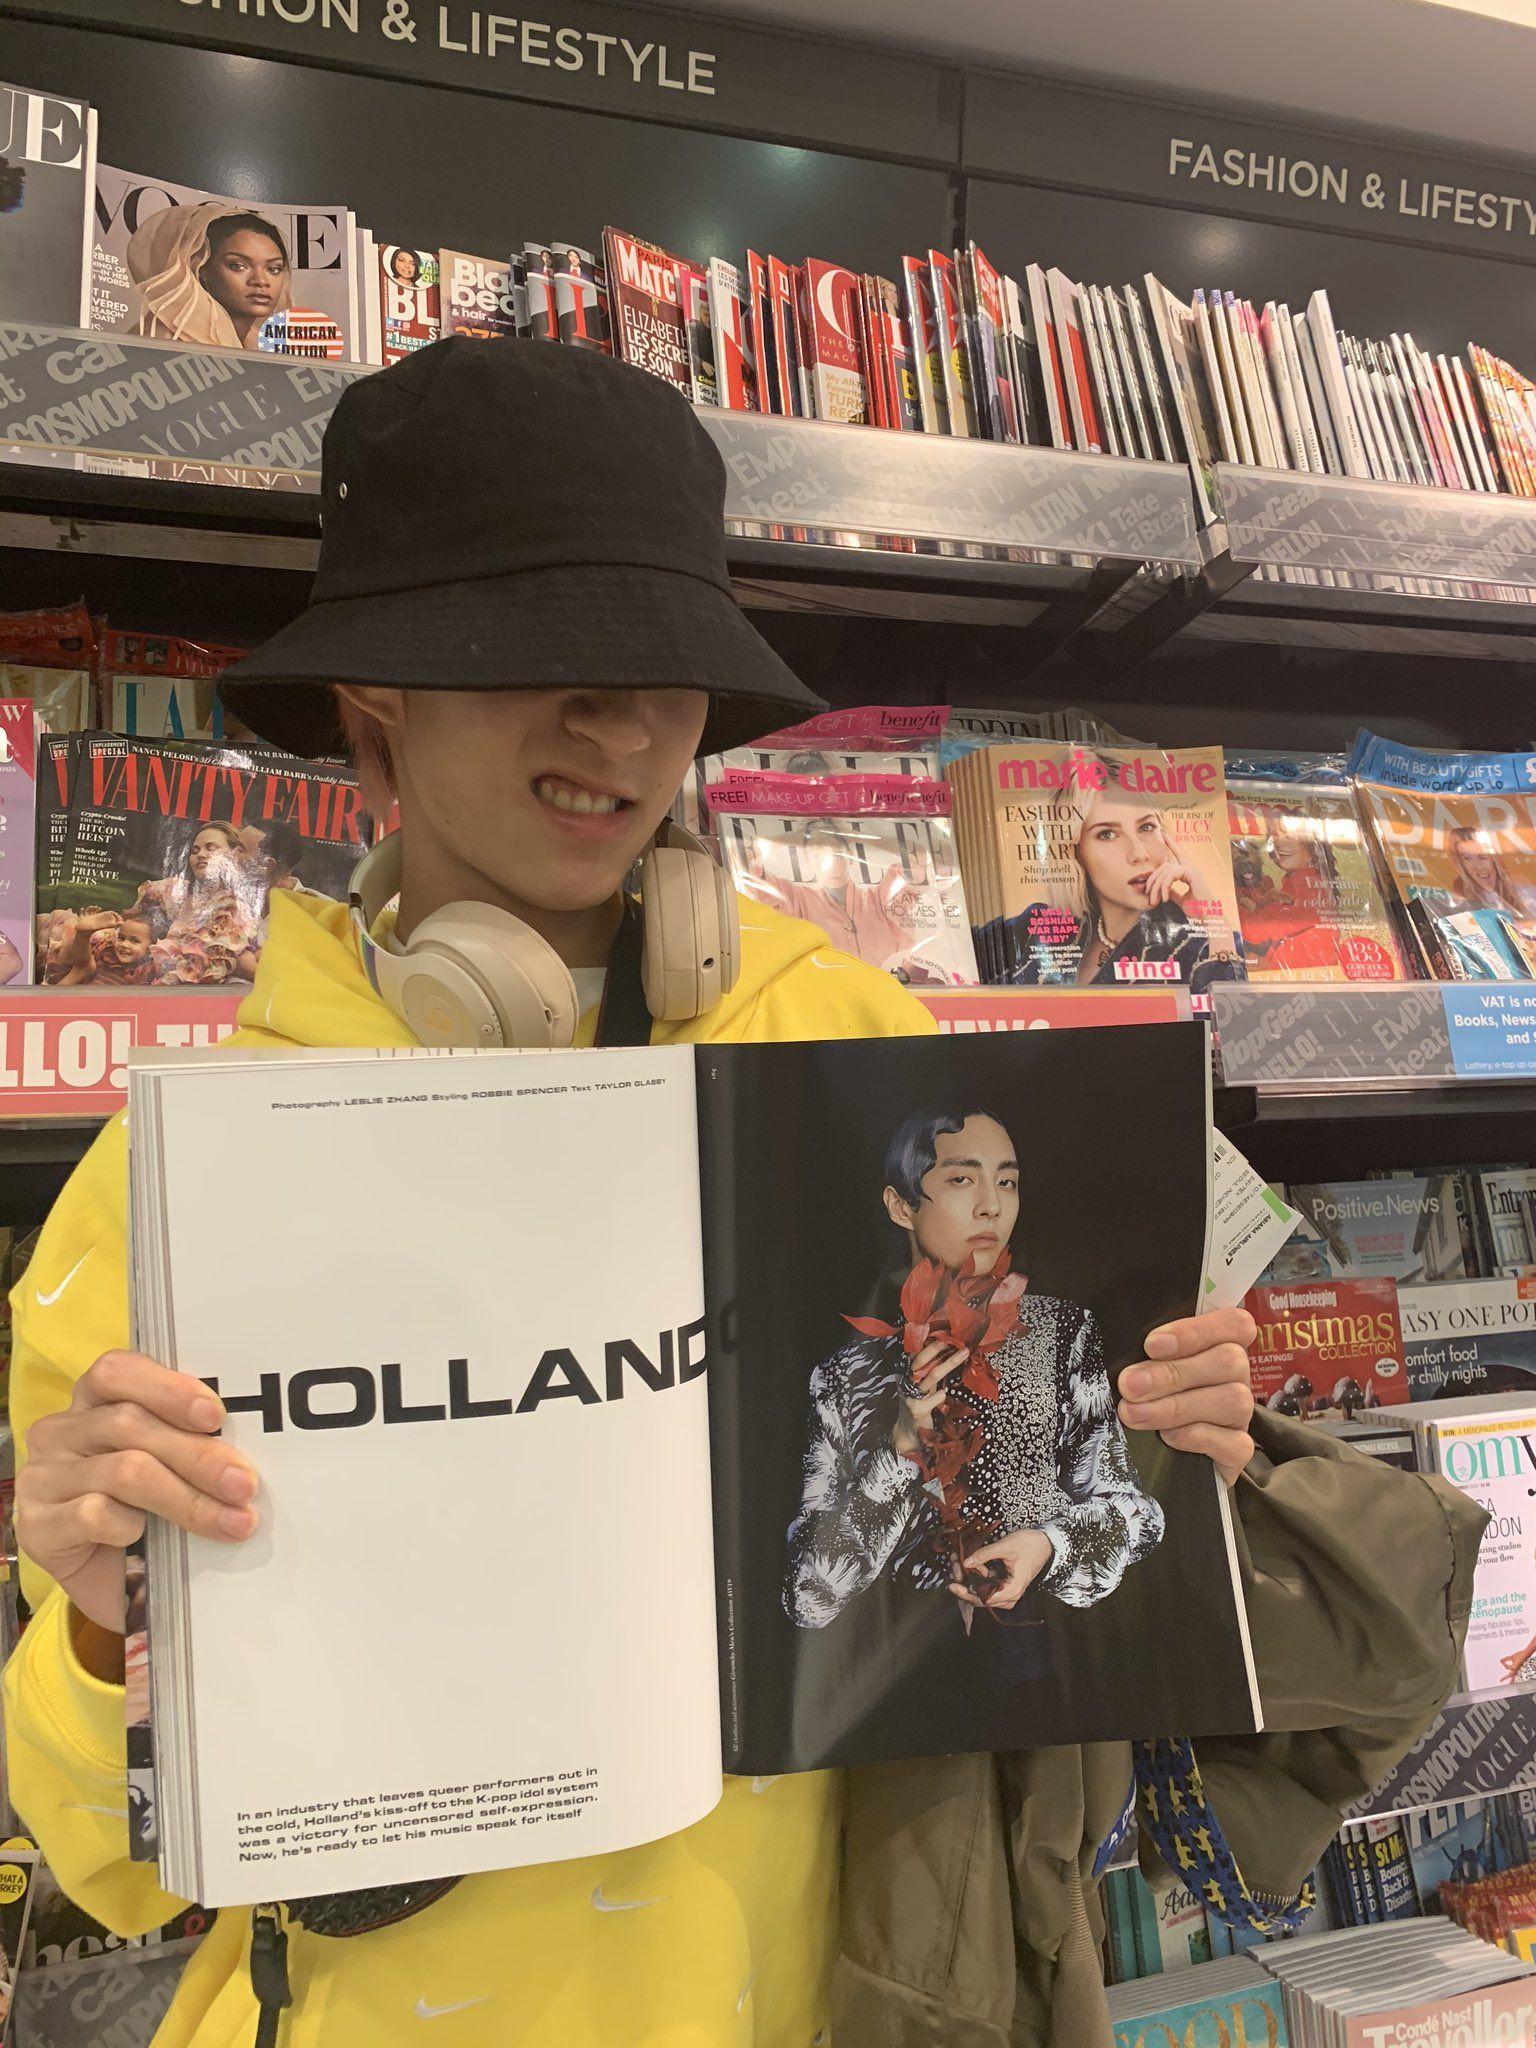 Sänger Holland